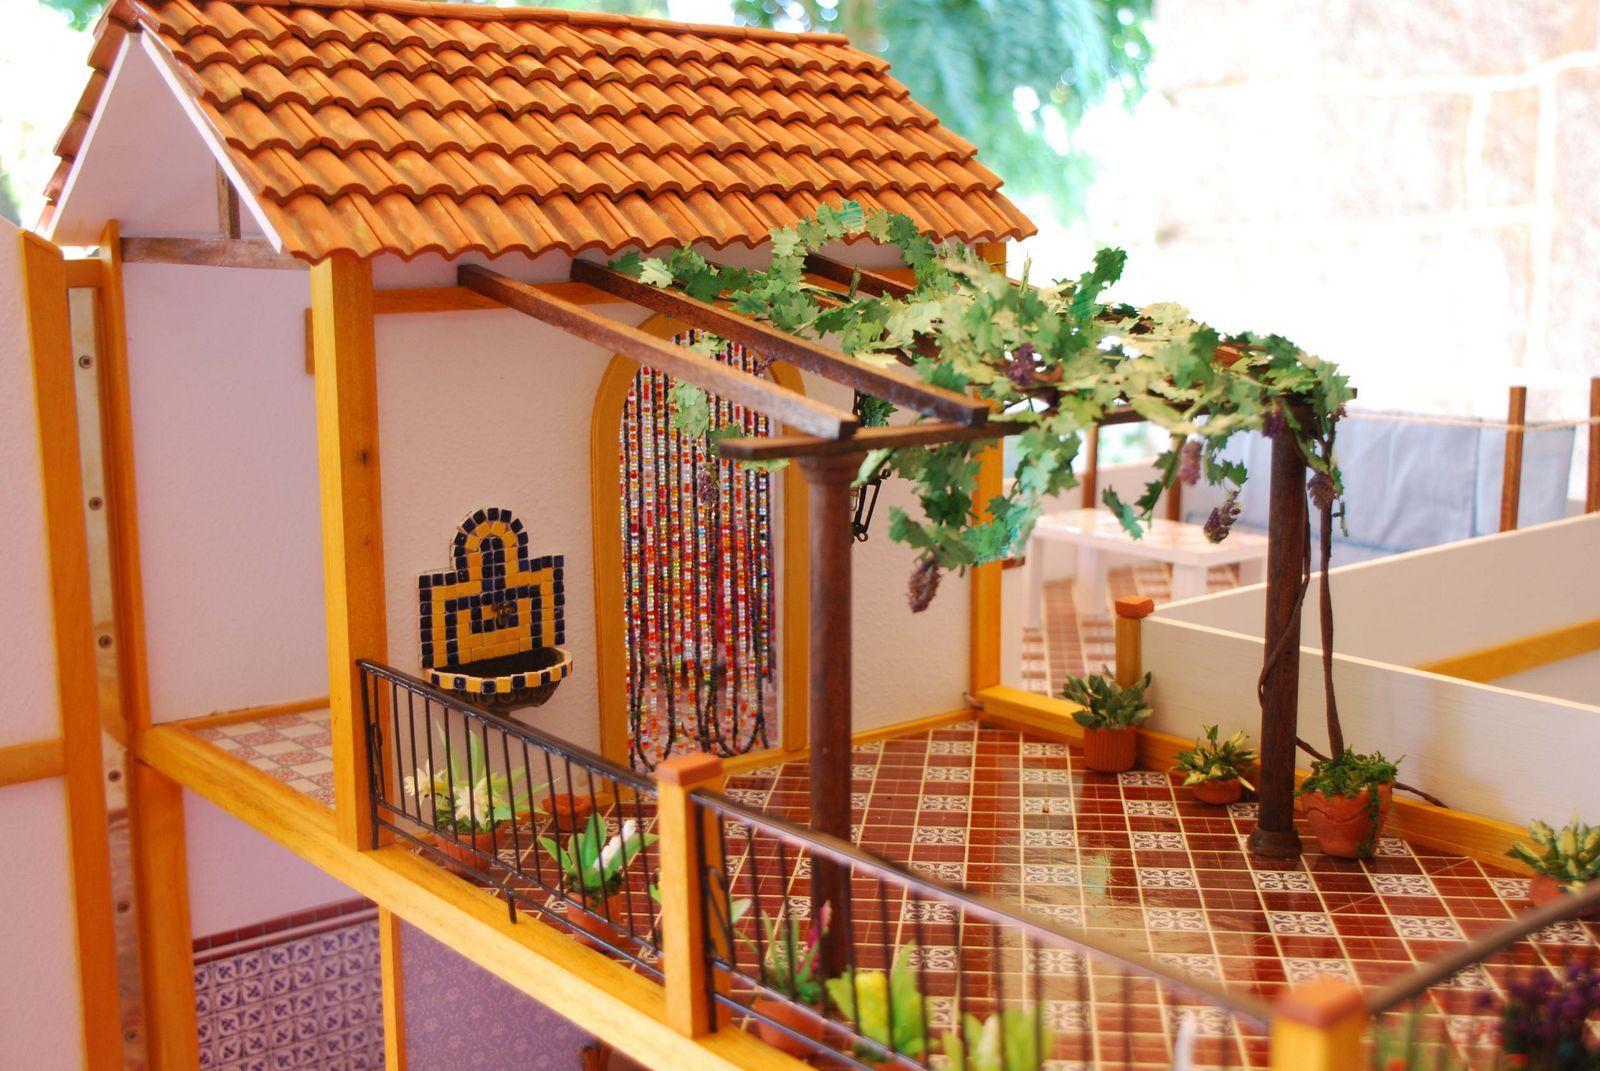 Casa andaluza de altaya dolls house projects pinterest for Casa andaluza